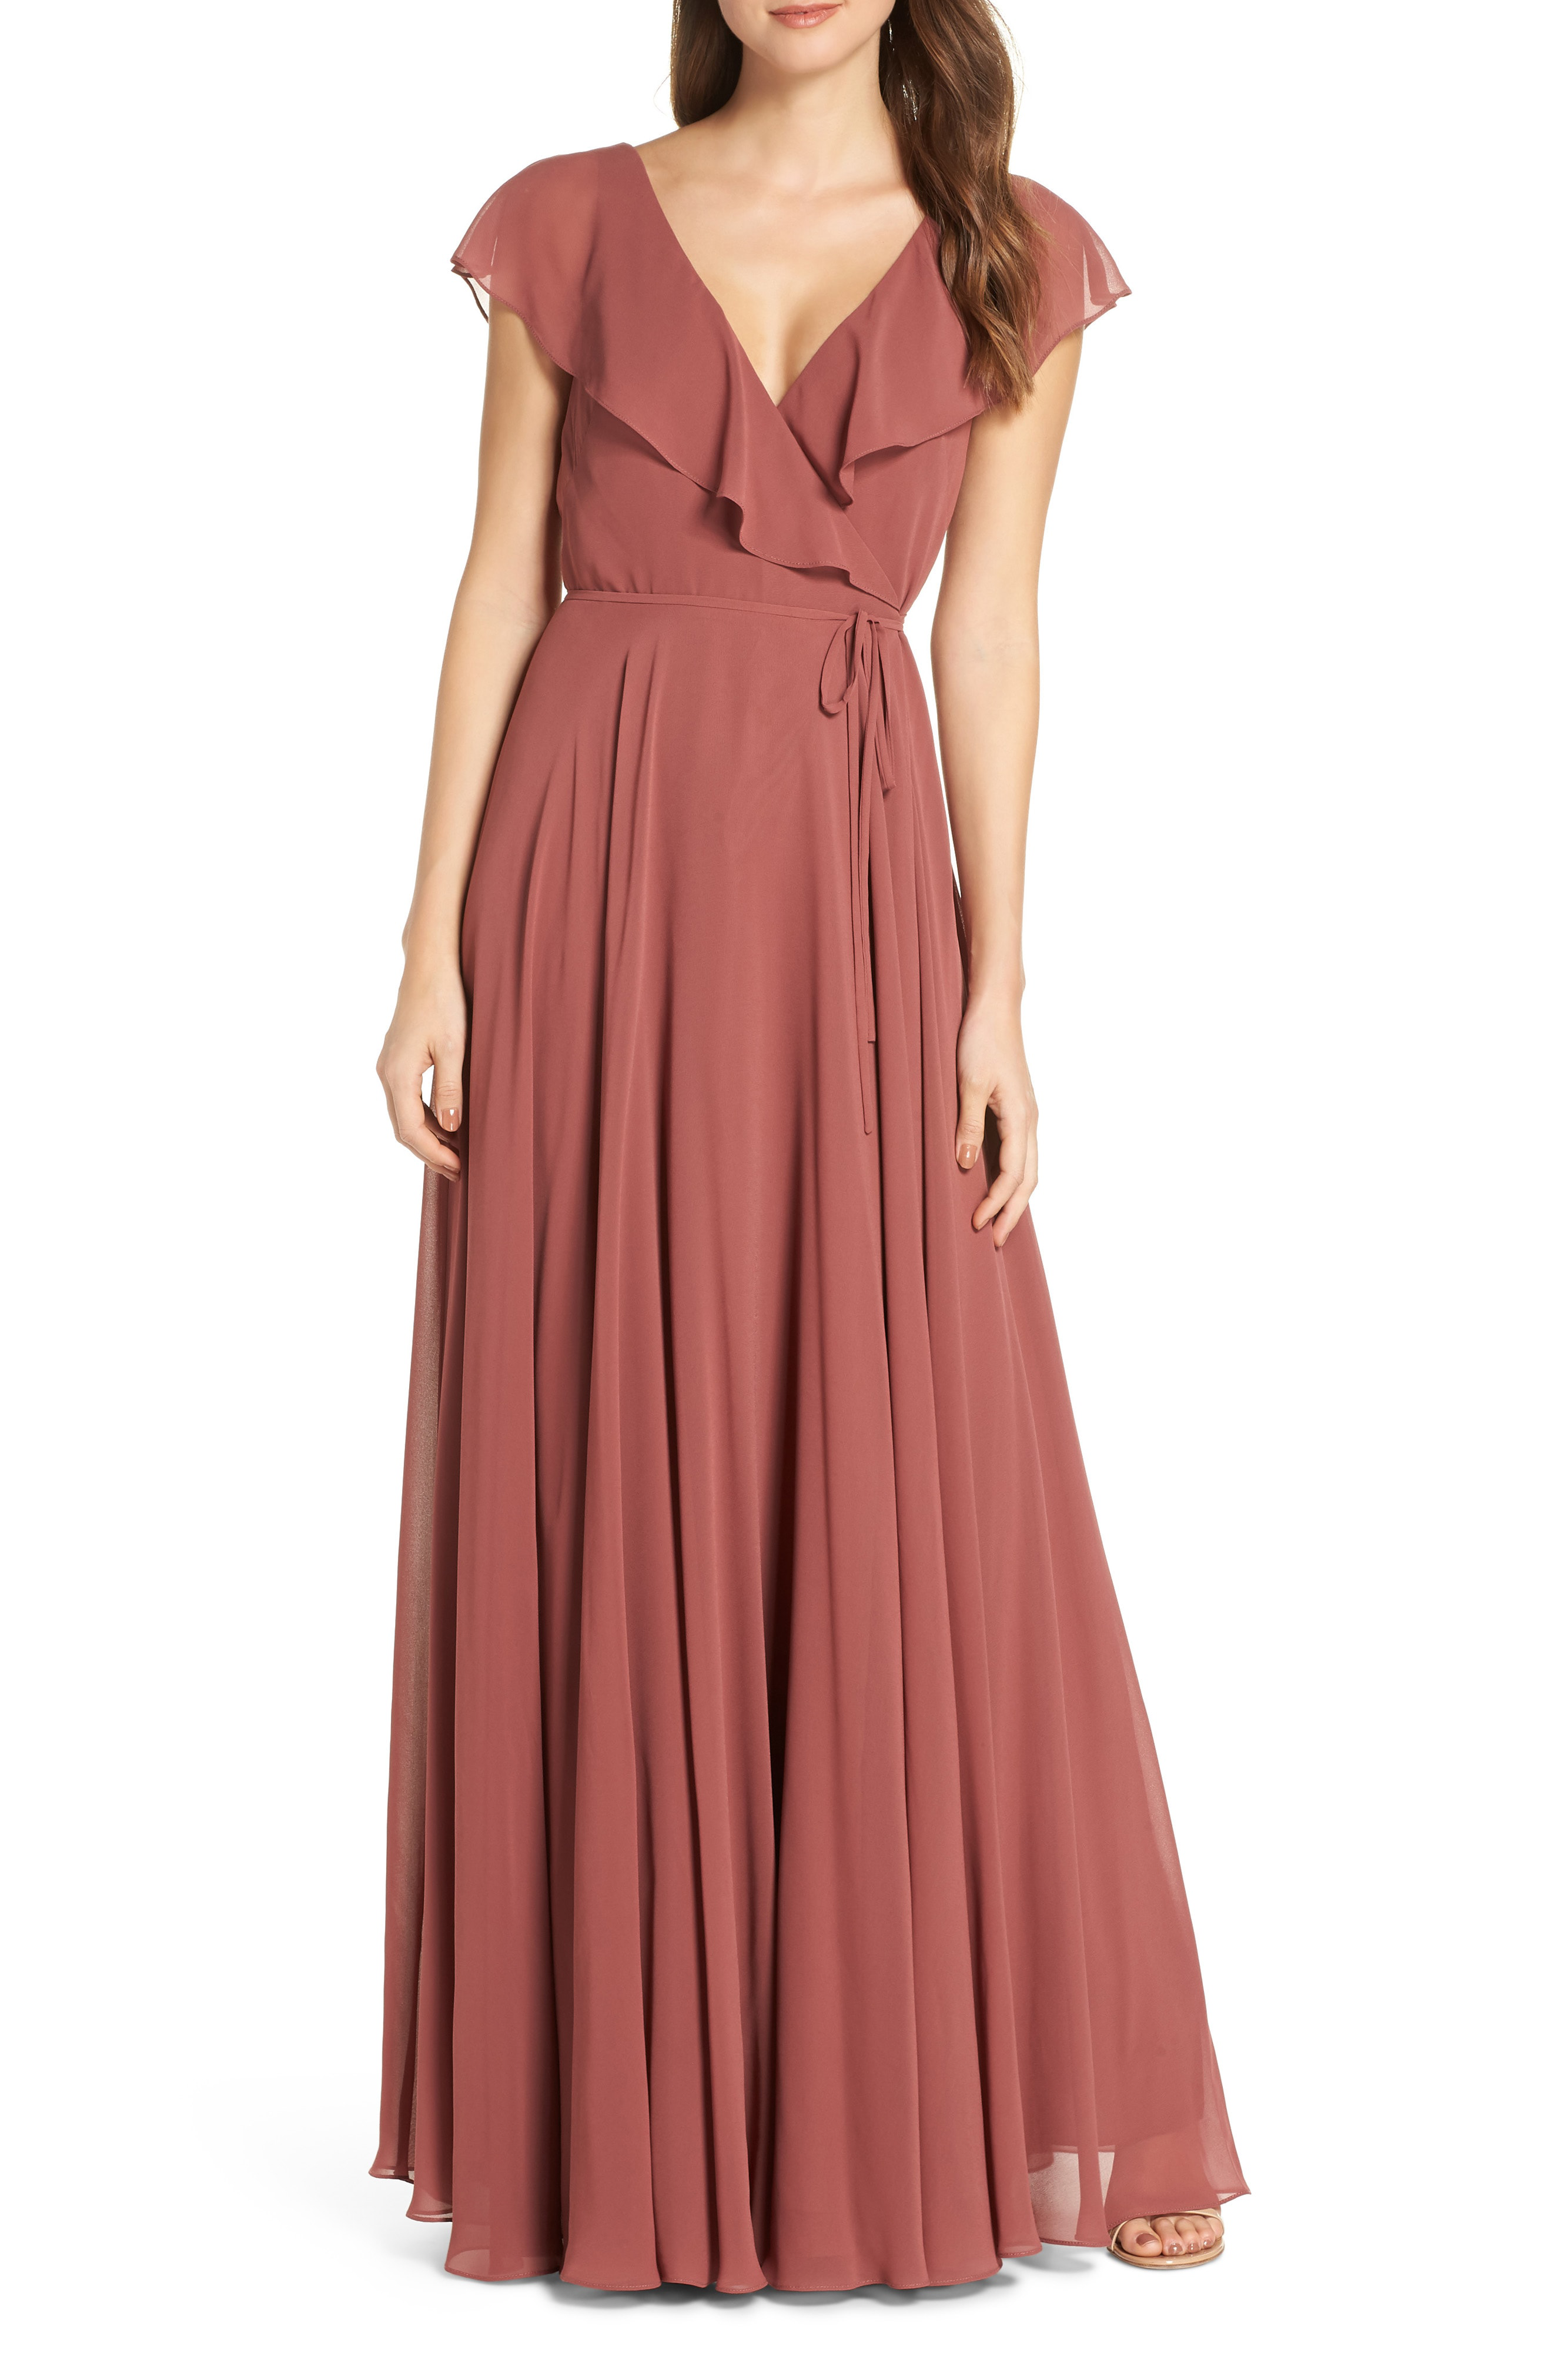 482f82e049c Jenny Yoo Faye Ruffle Wrap Chiffon Evening Dress In Cinnamon Rose ...